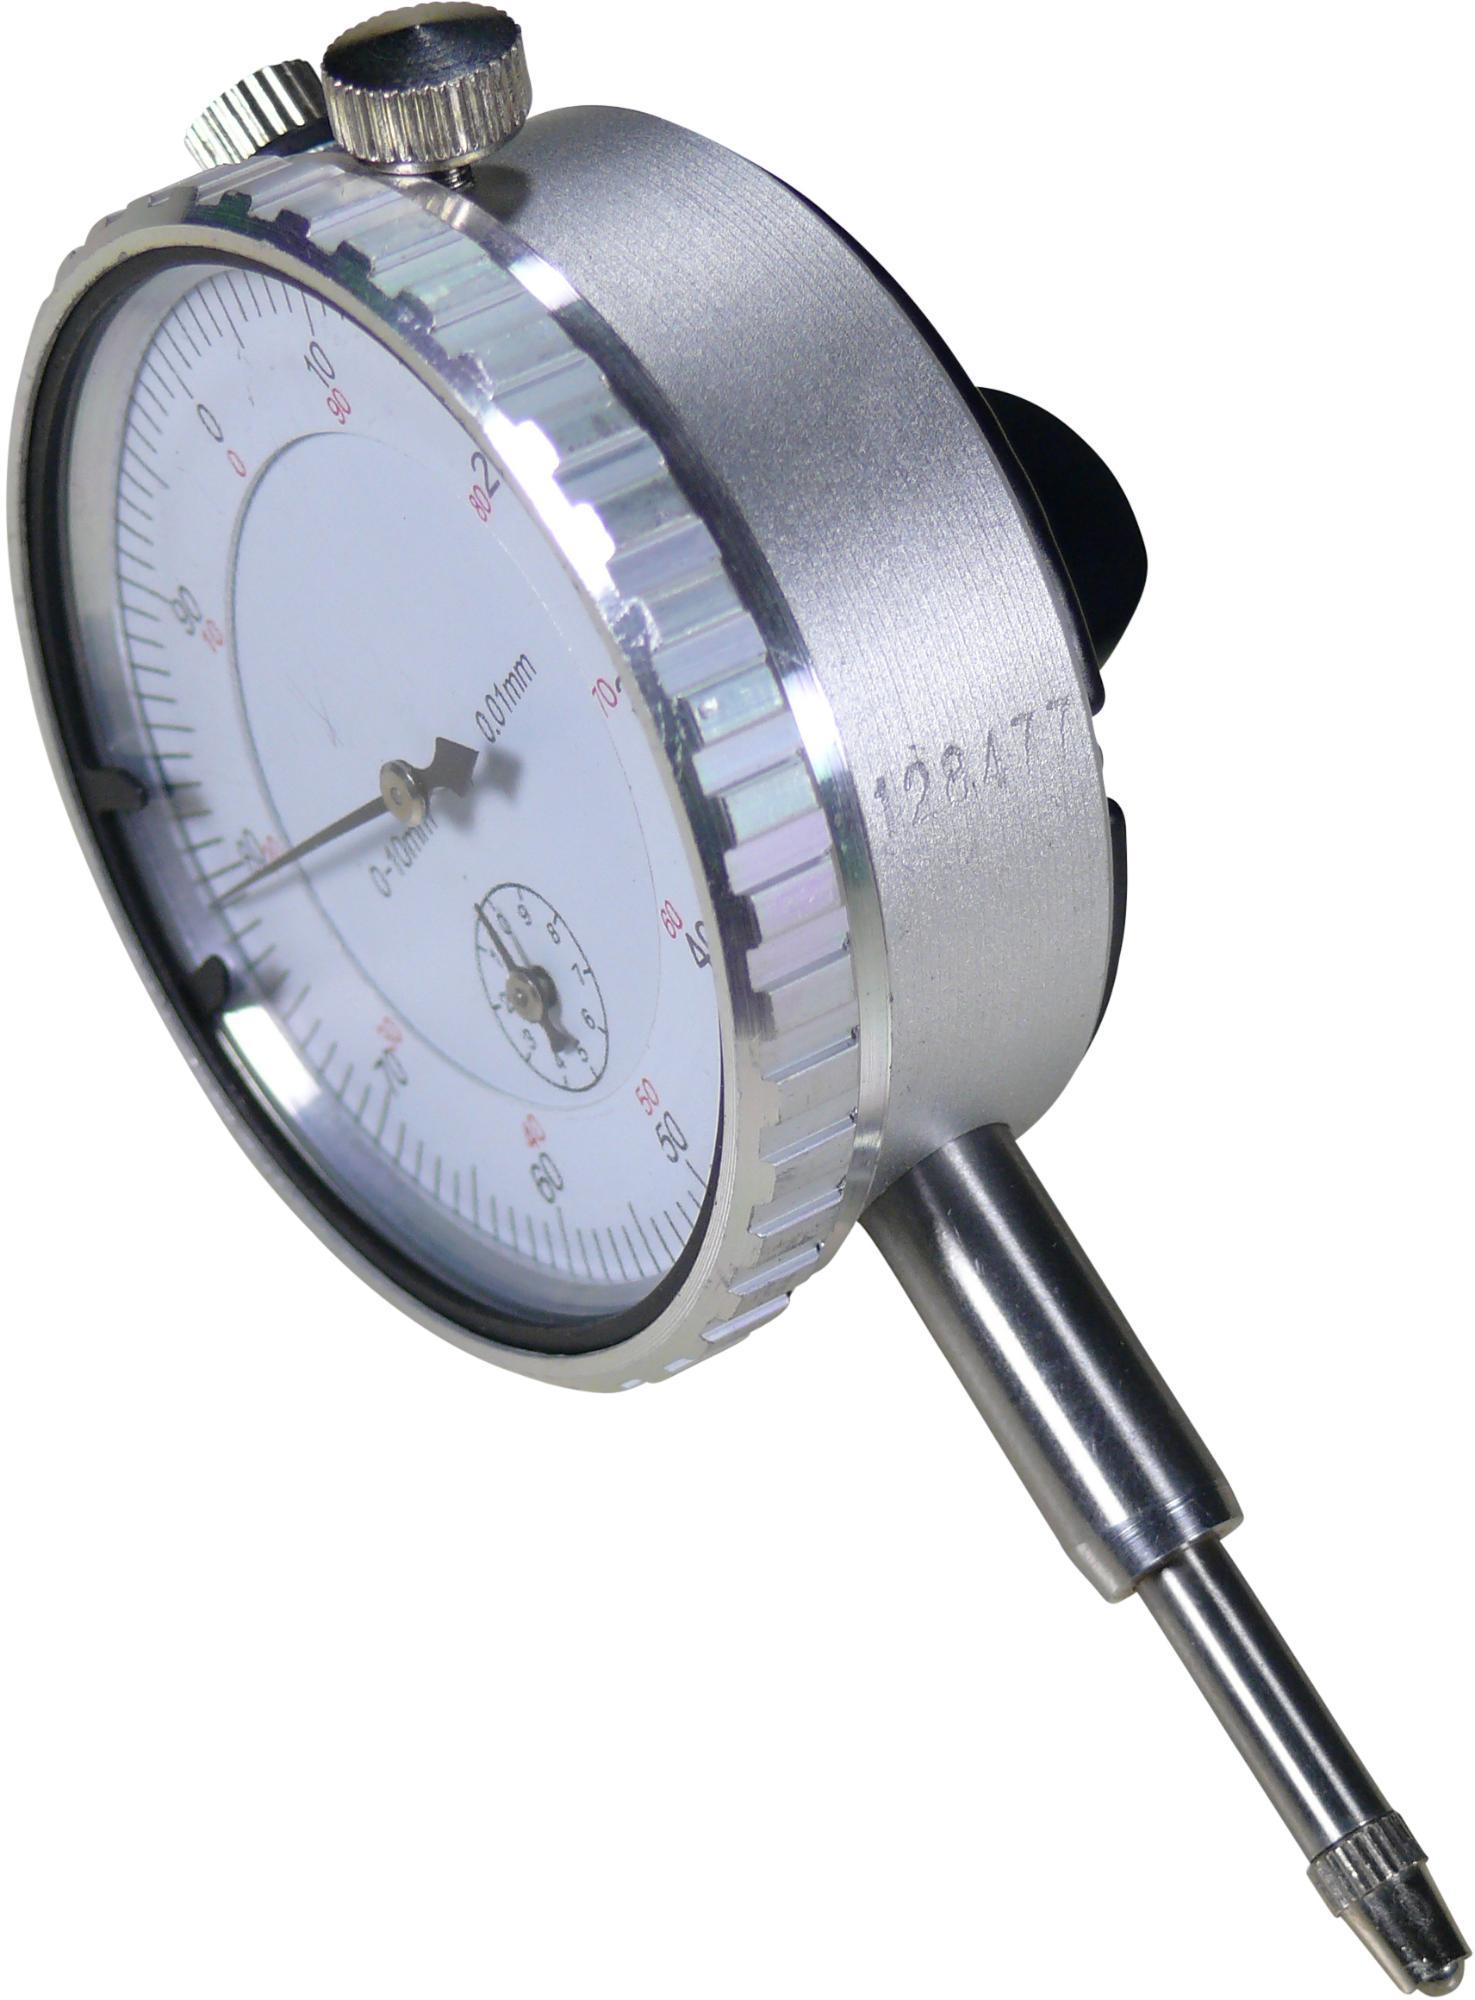 Meradlo, Dv 878, ø 60 mm, 8 mm, H6